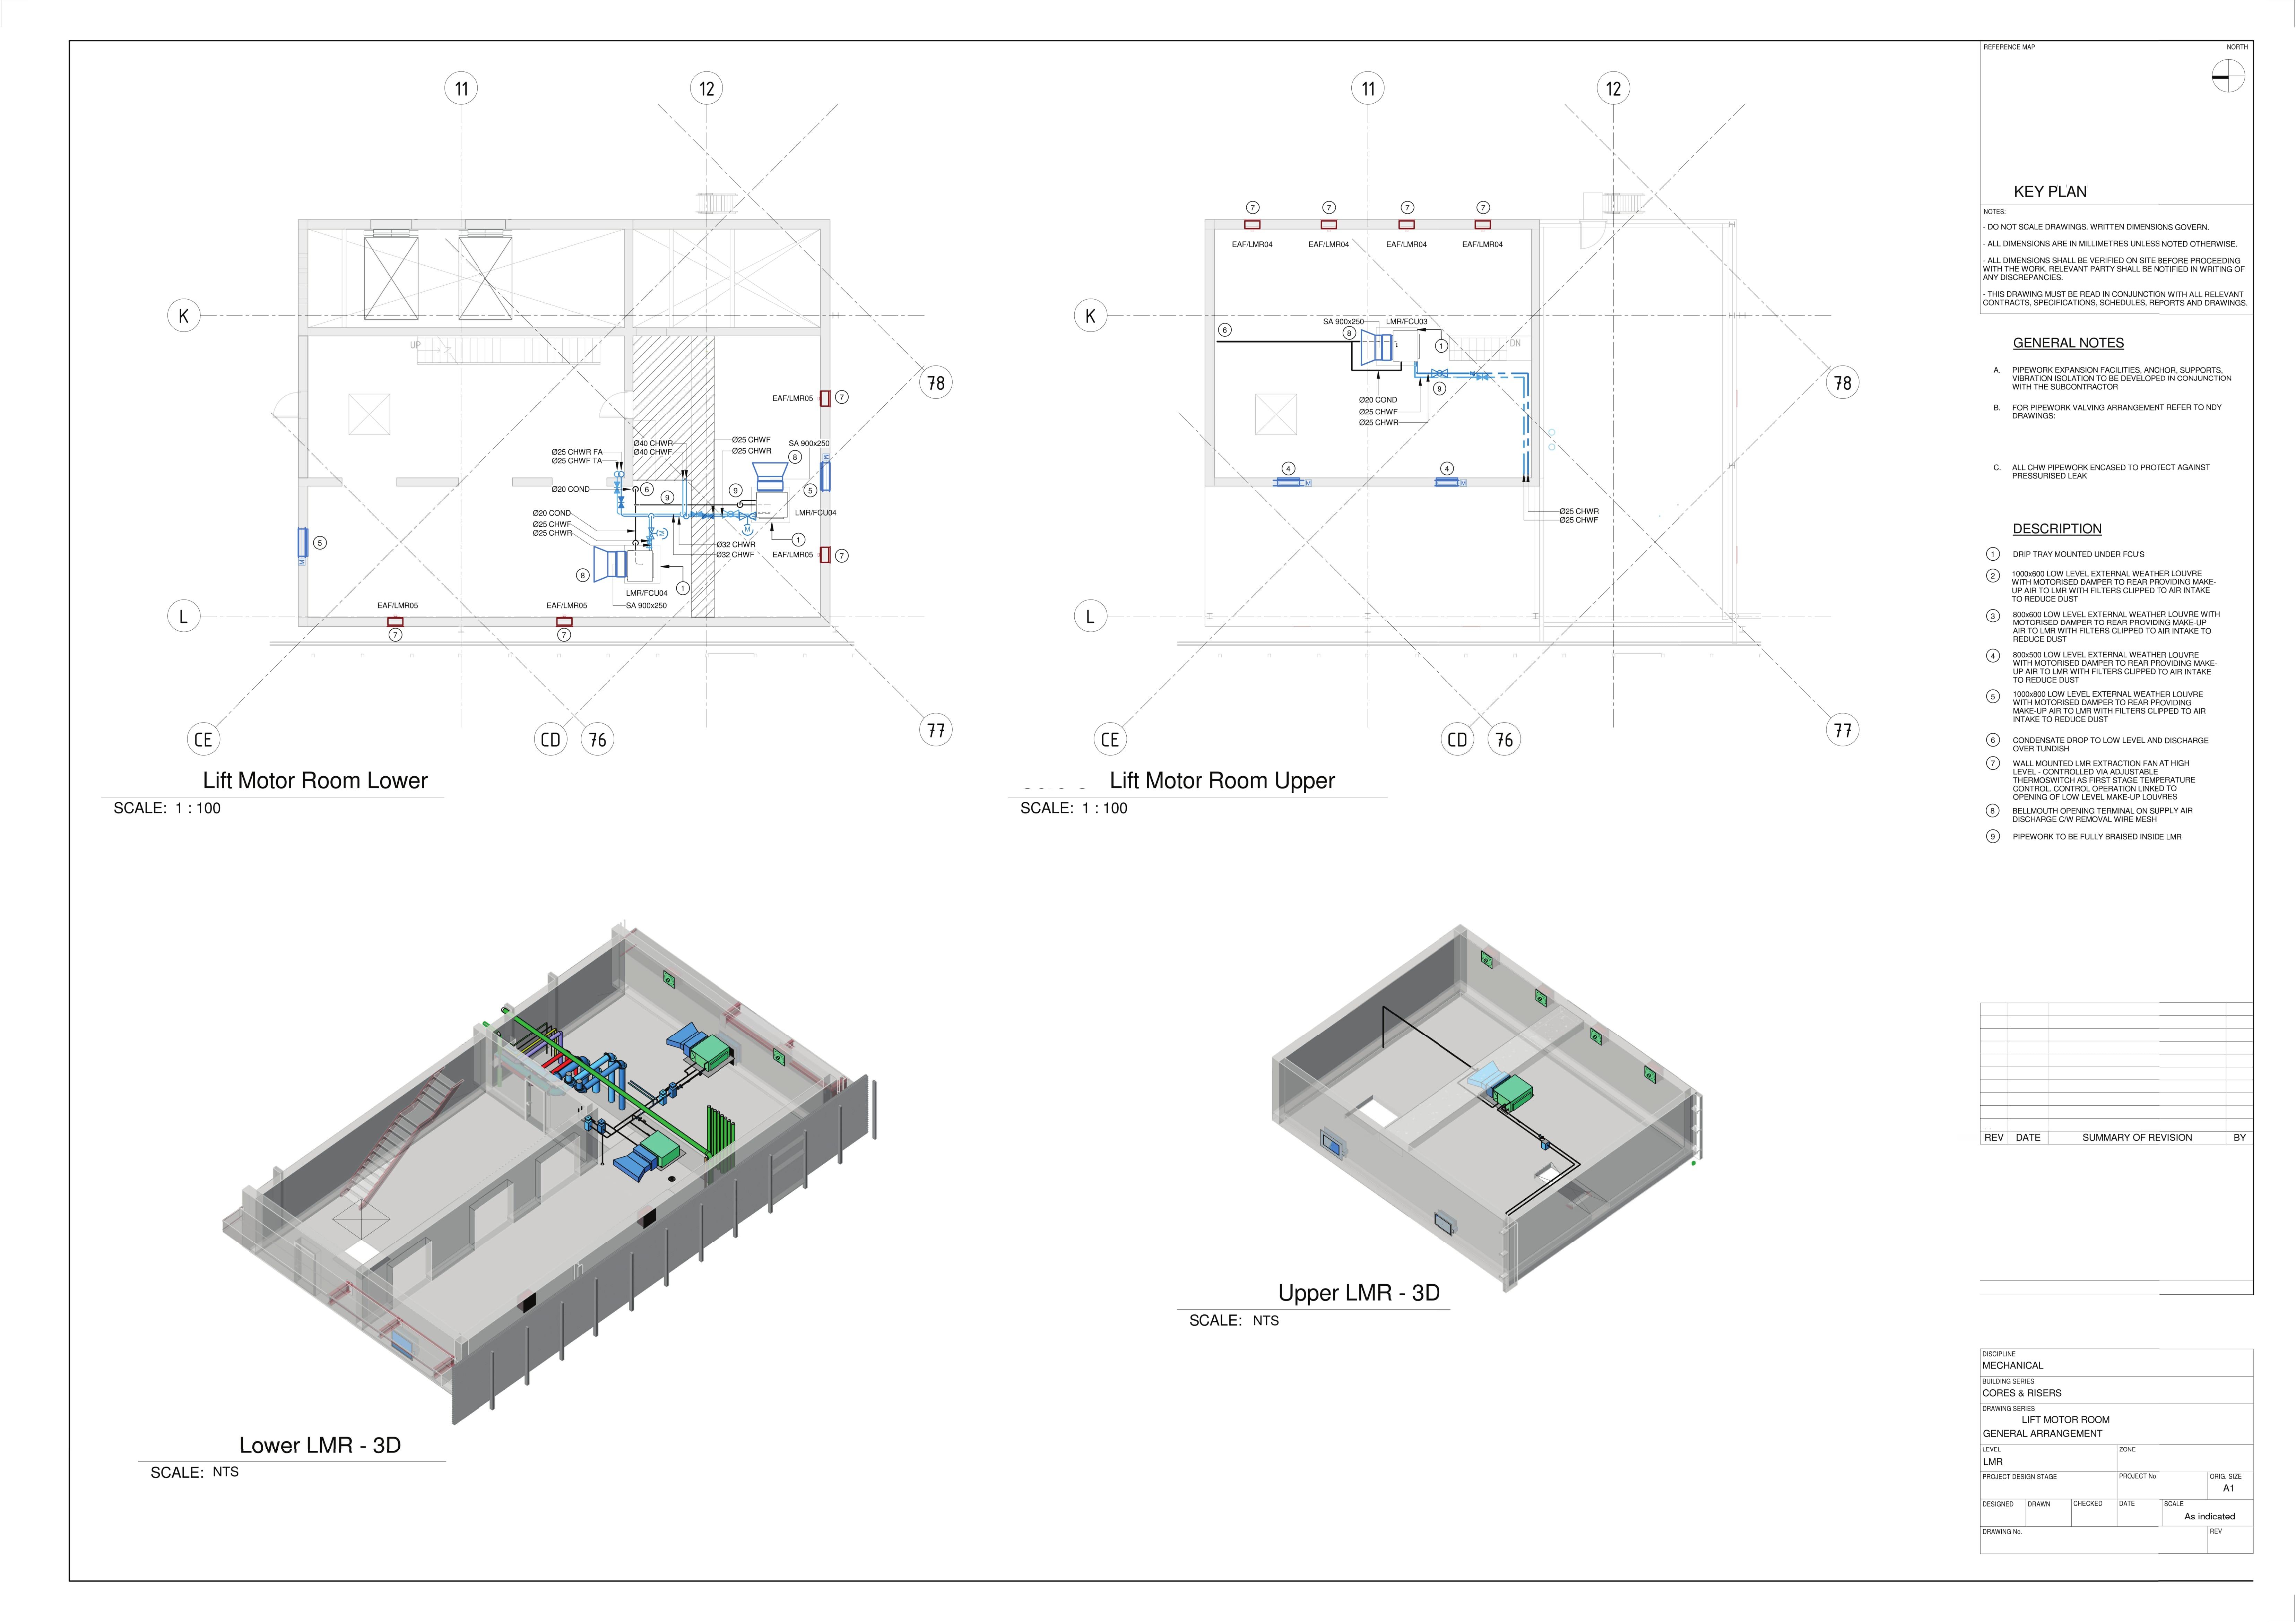 Lift Motor Rooms General Arrangement